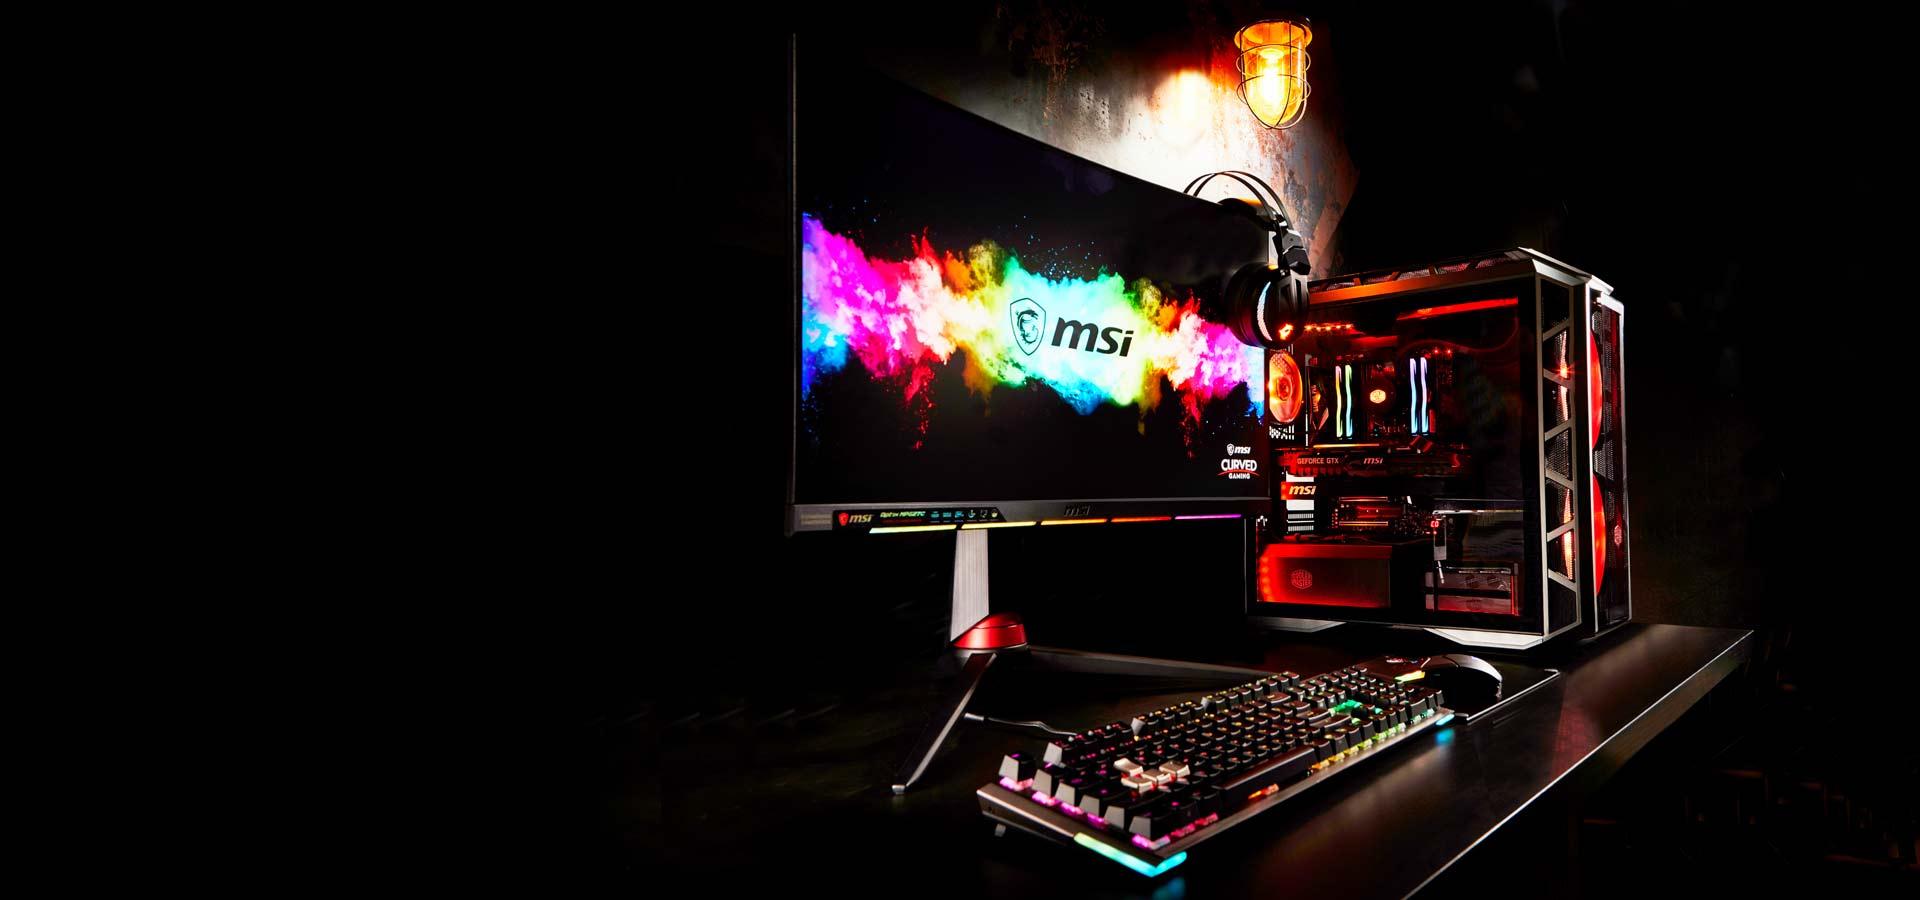 MSI GeForce RTX 2080 Super Gaming X Trio Graphic Cards